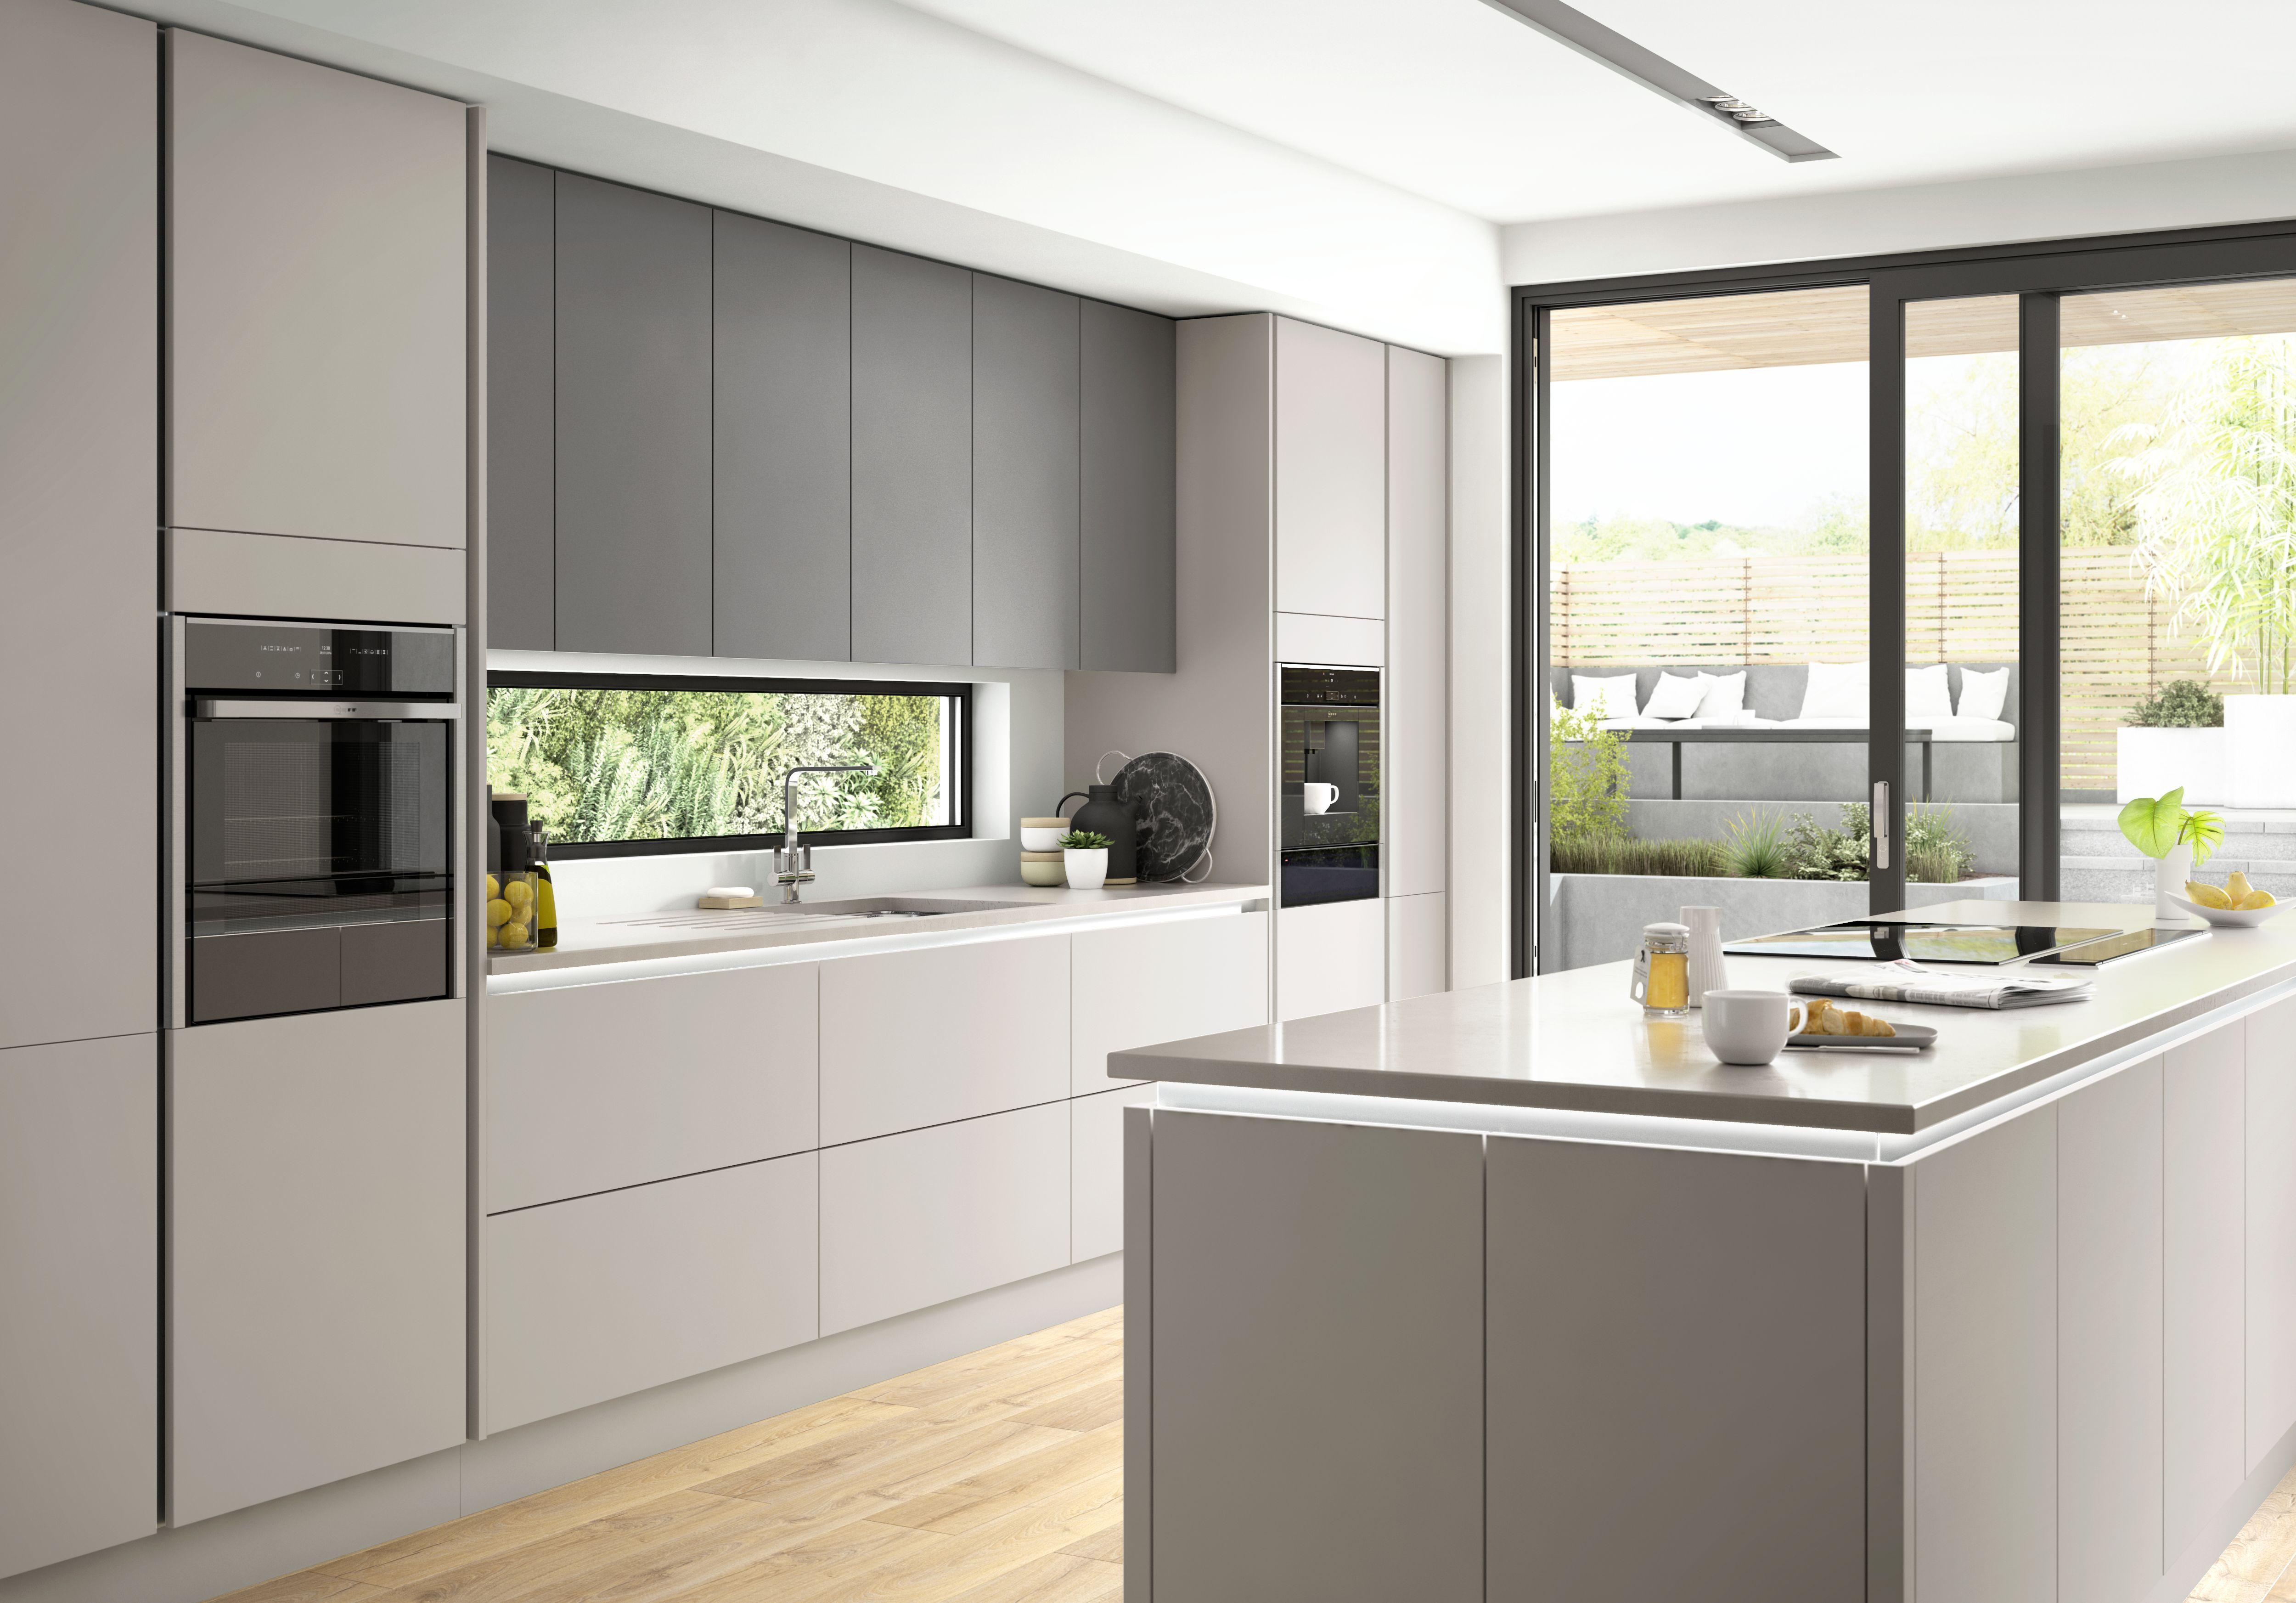 Light grey kitchen with wood floor